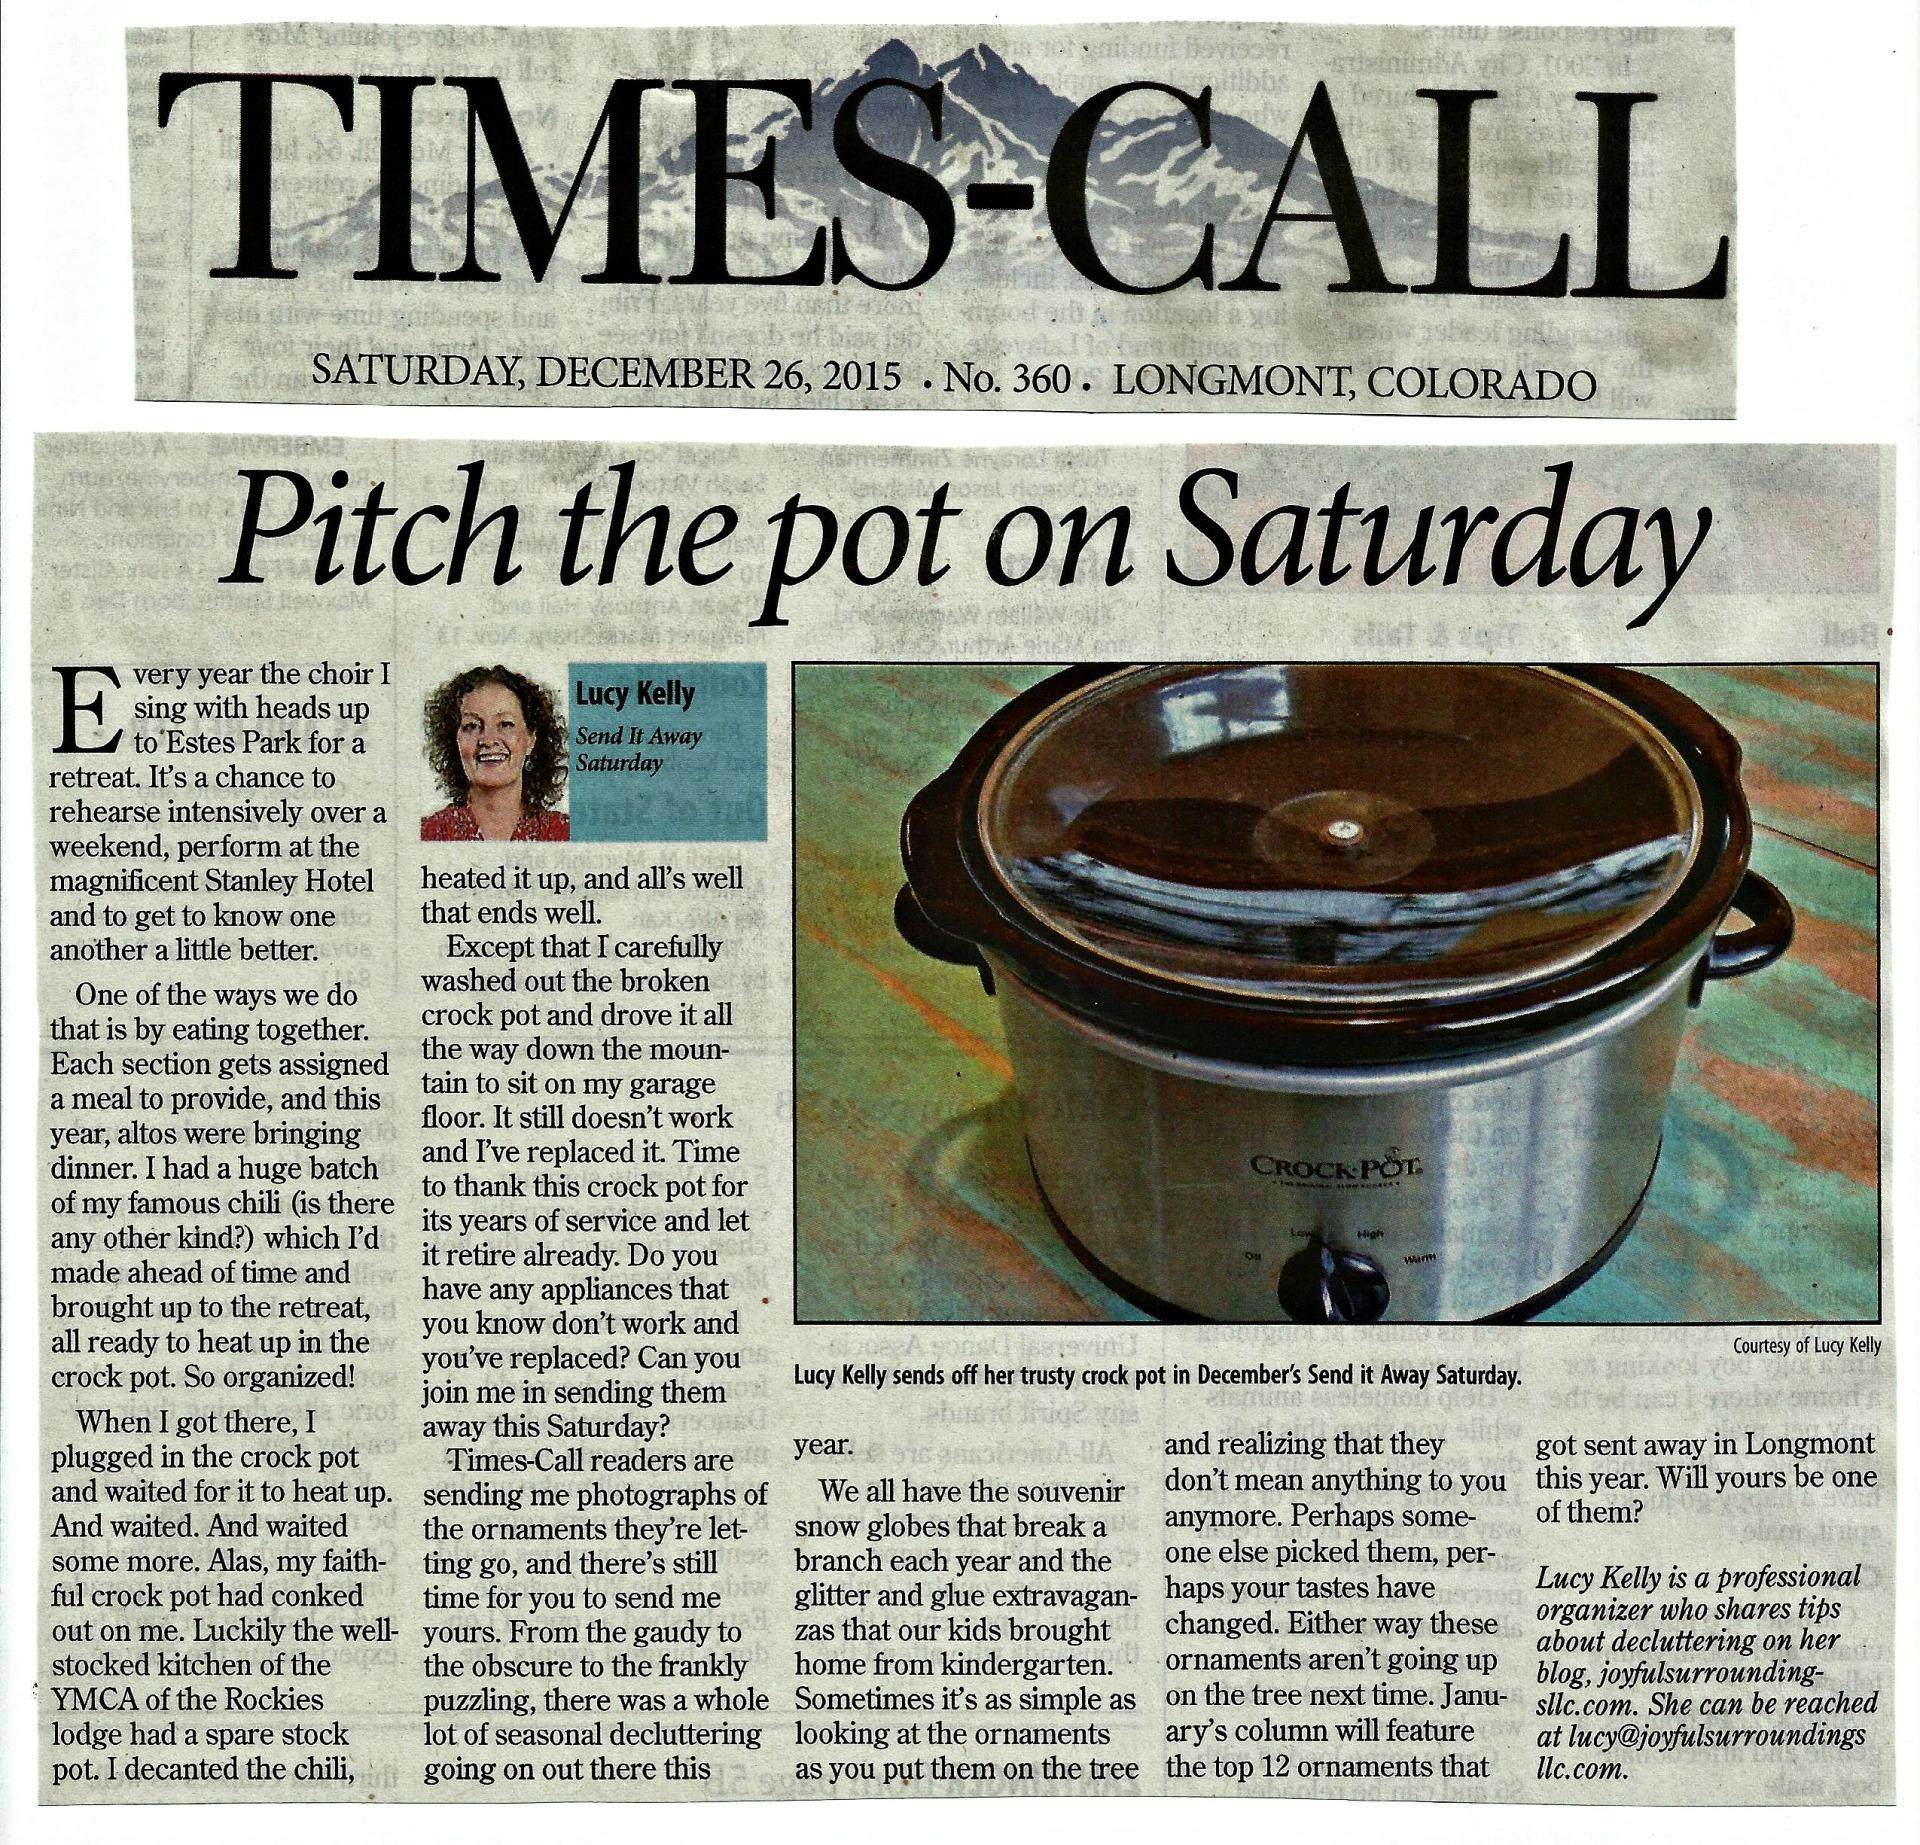 Longmont Times-Call Send it away Saturday column December 2015